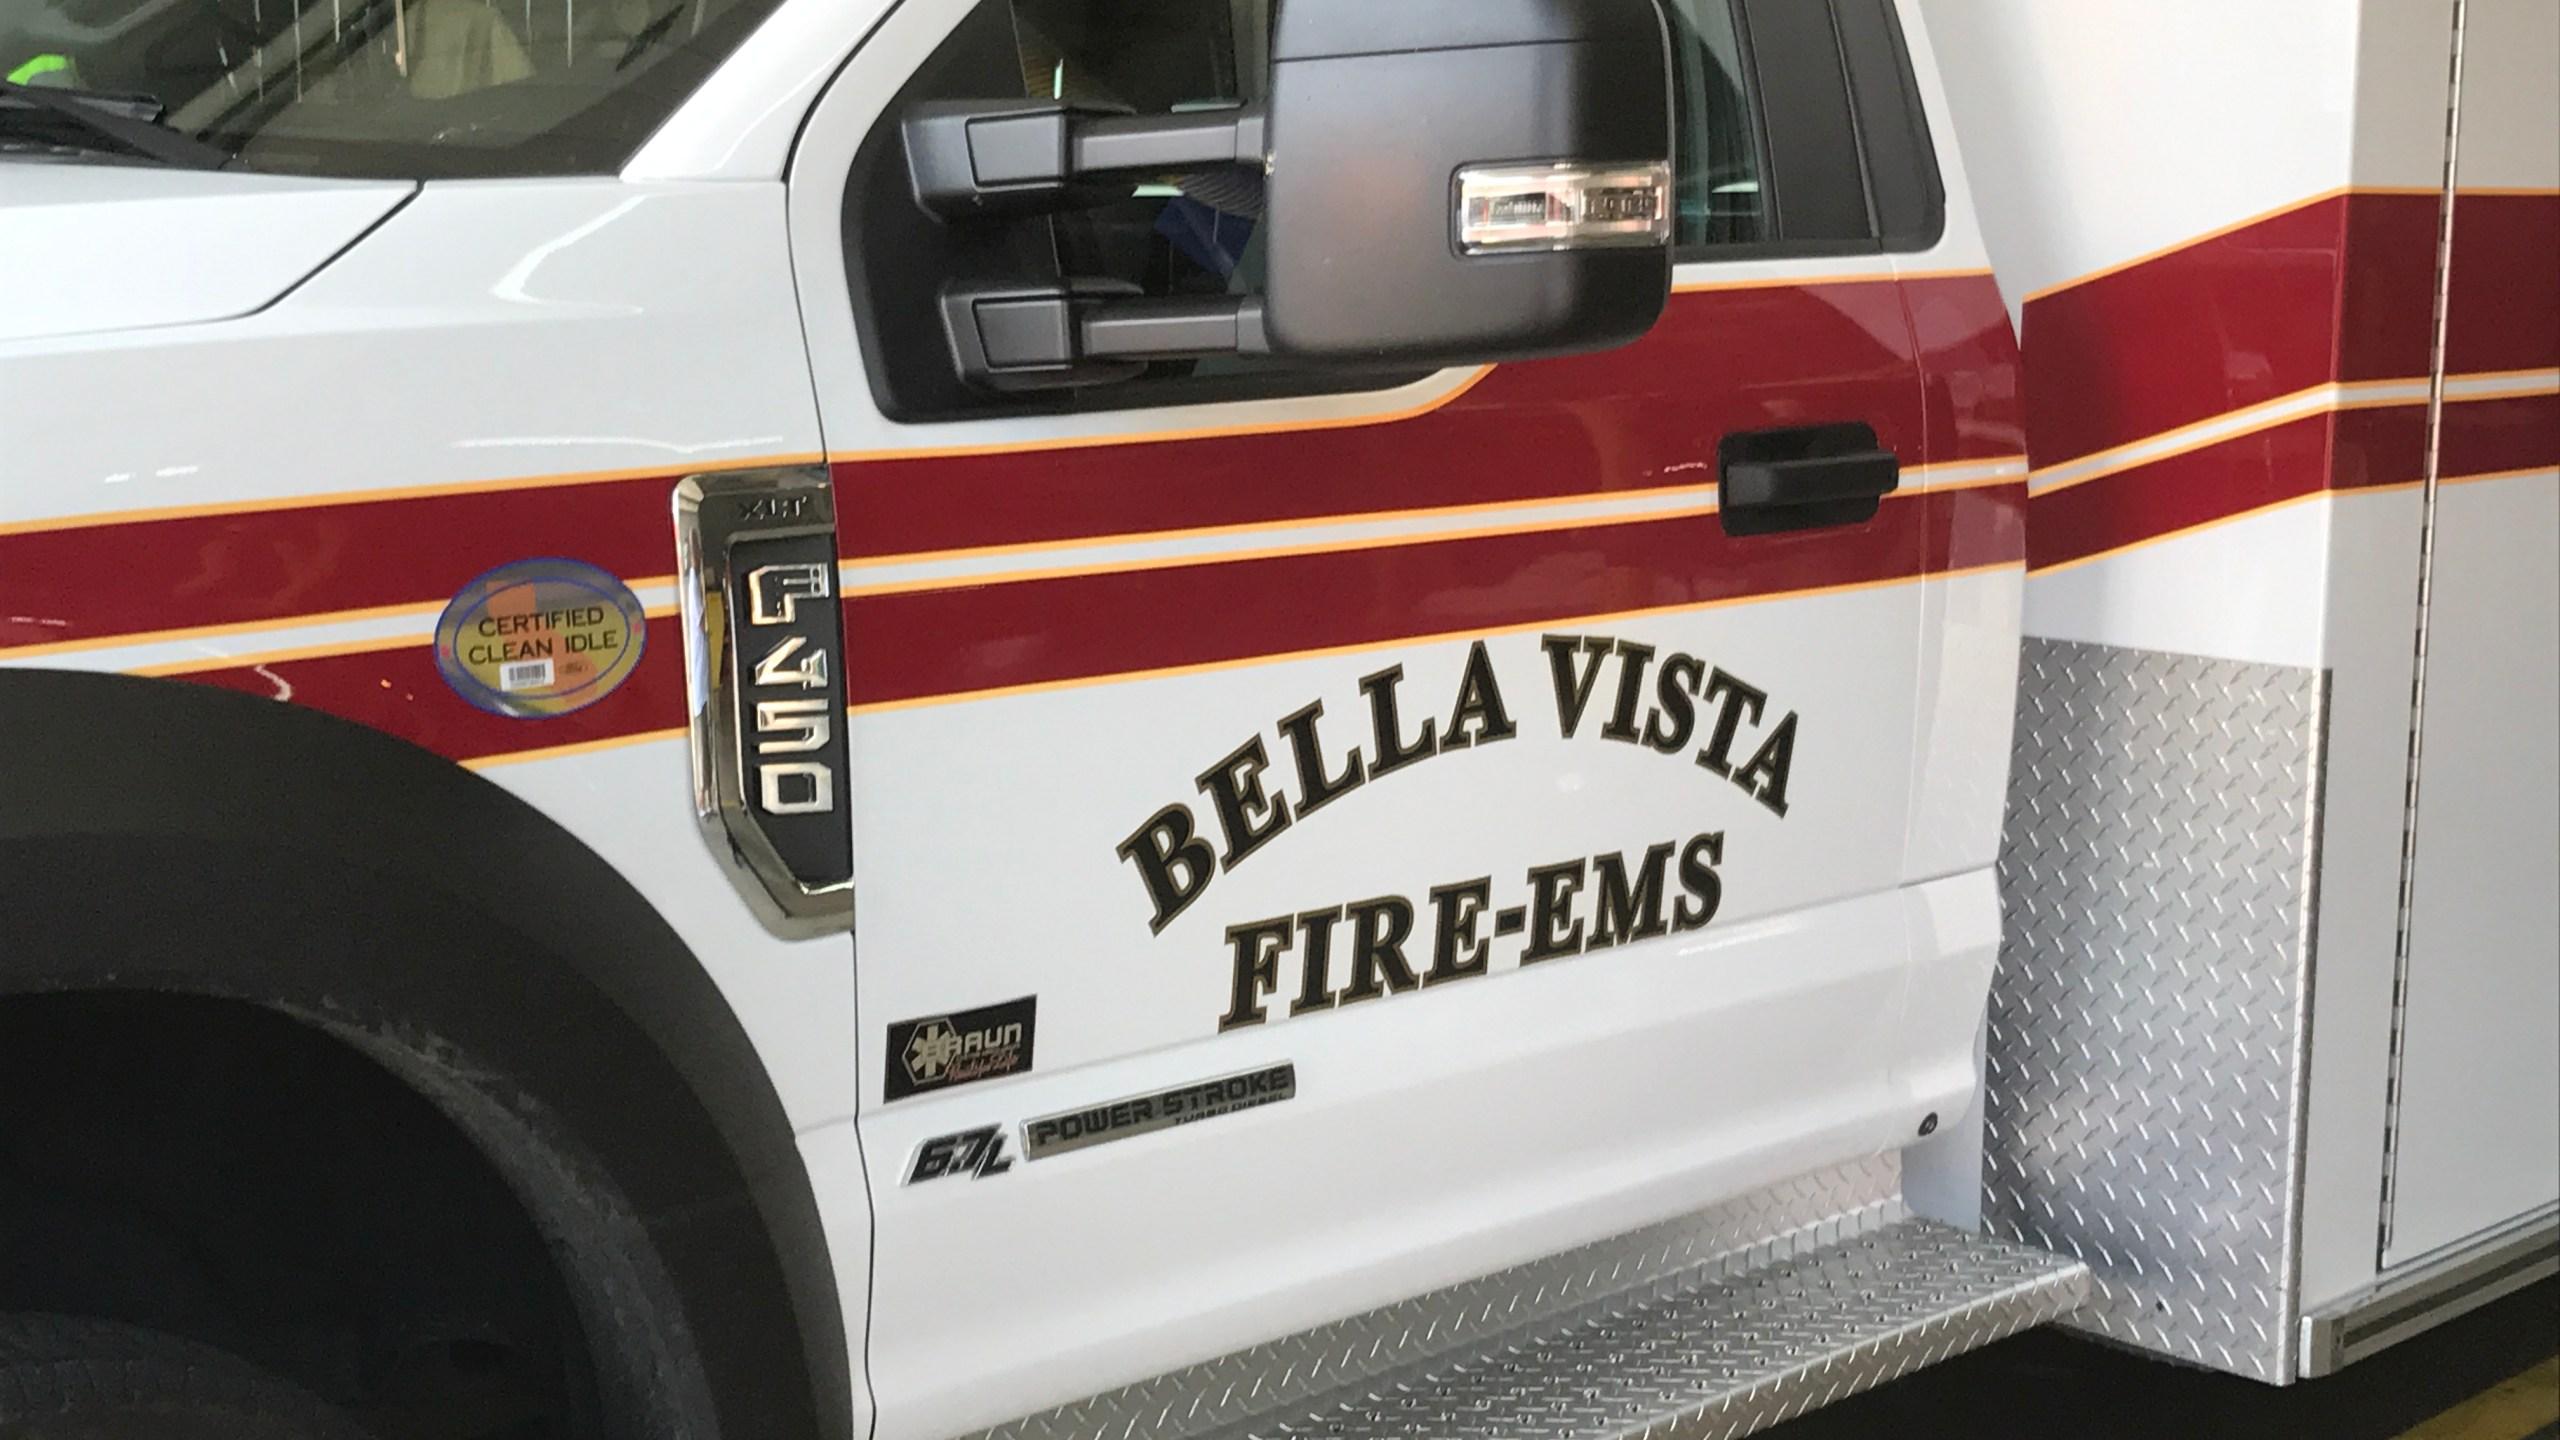 BELLA VISTA FIRE DEPT. 2_1500600869582.JPG